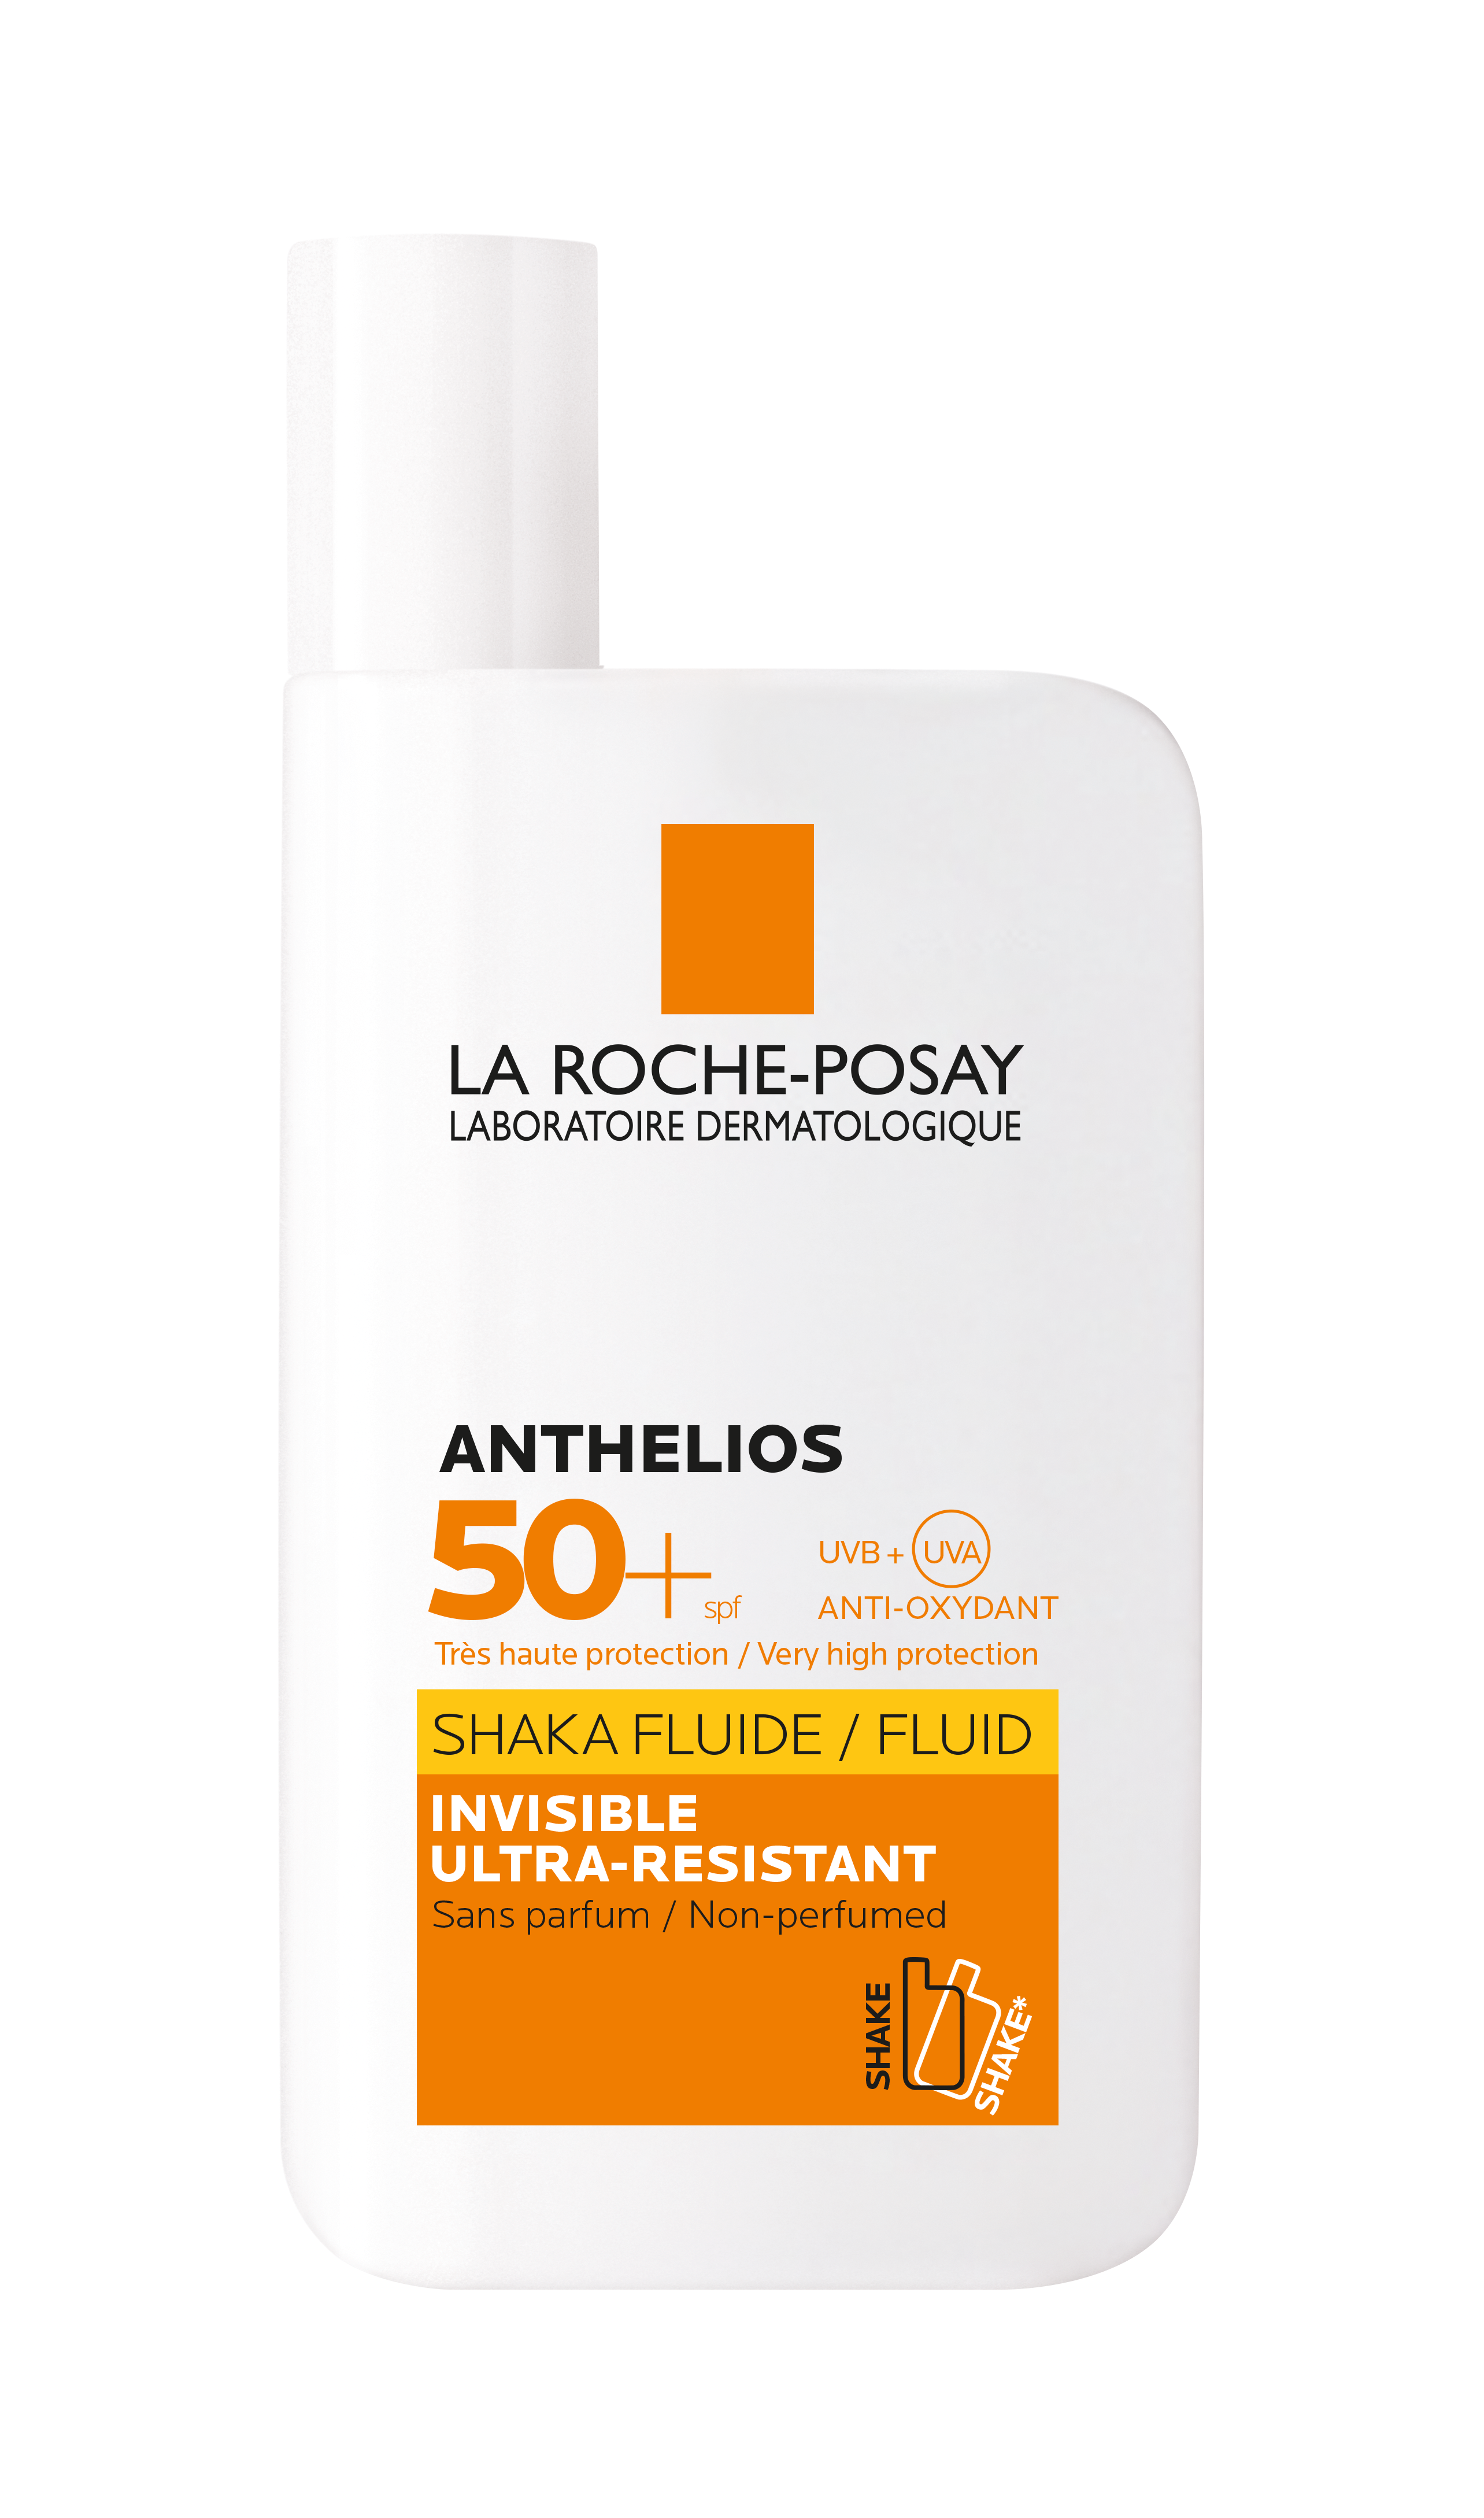 La Roche-Posay ANTHELIOS XL  全效廣譜防曬系列系列的ANTHELIOS Shaka Fluid SPF50+ 全效廣譜輕盈隔離乳液 SPF50+  產品圖片